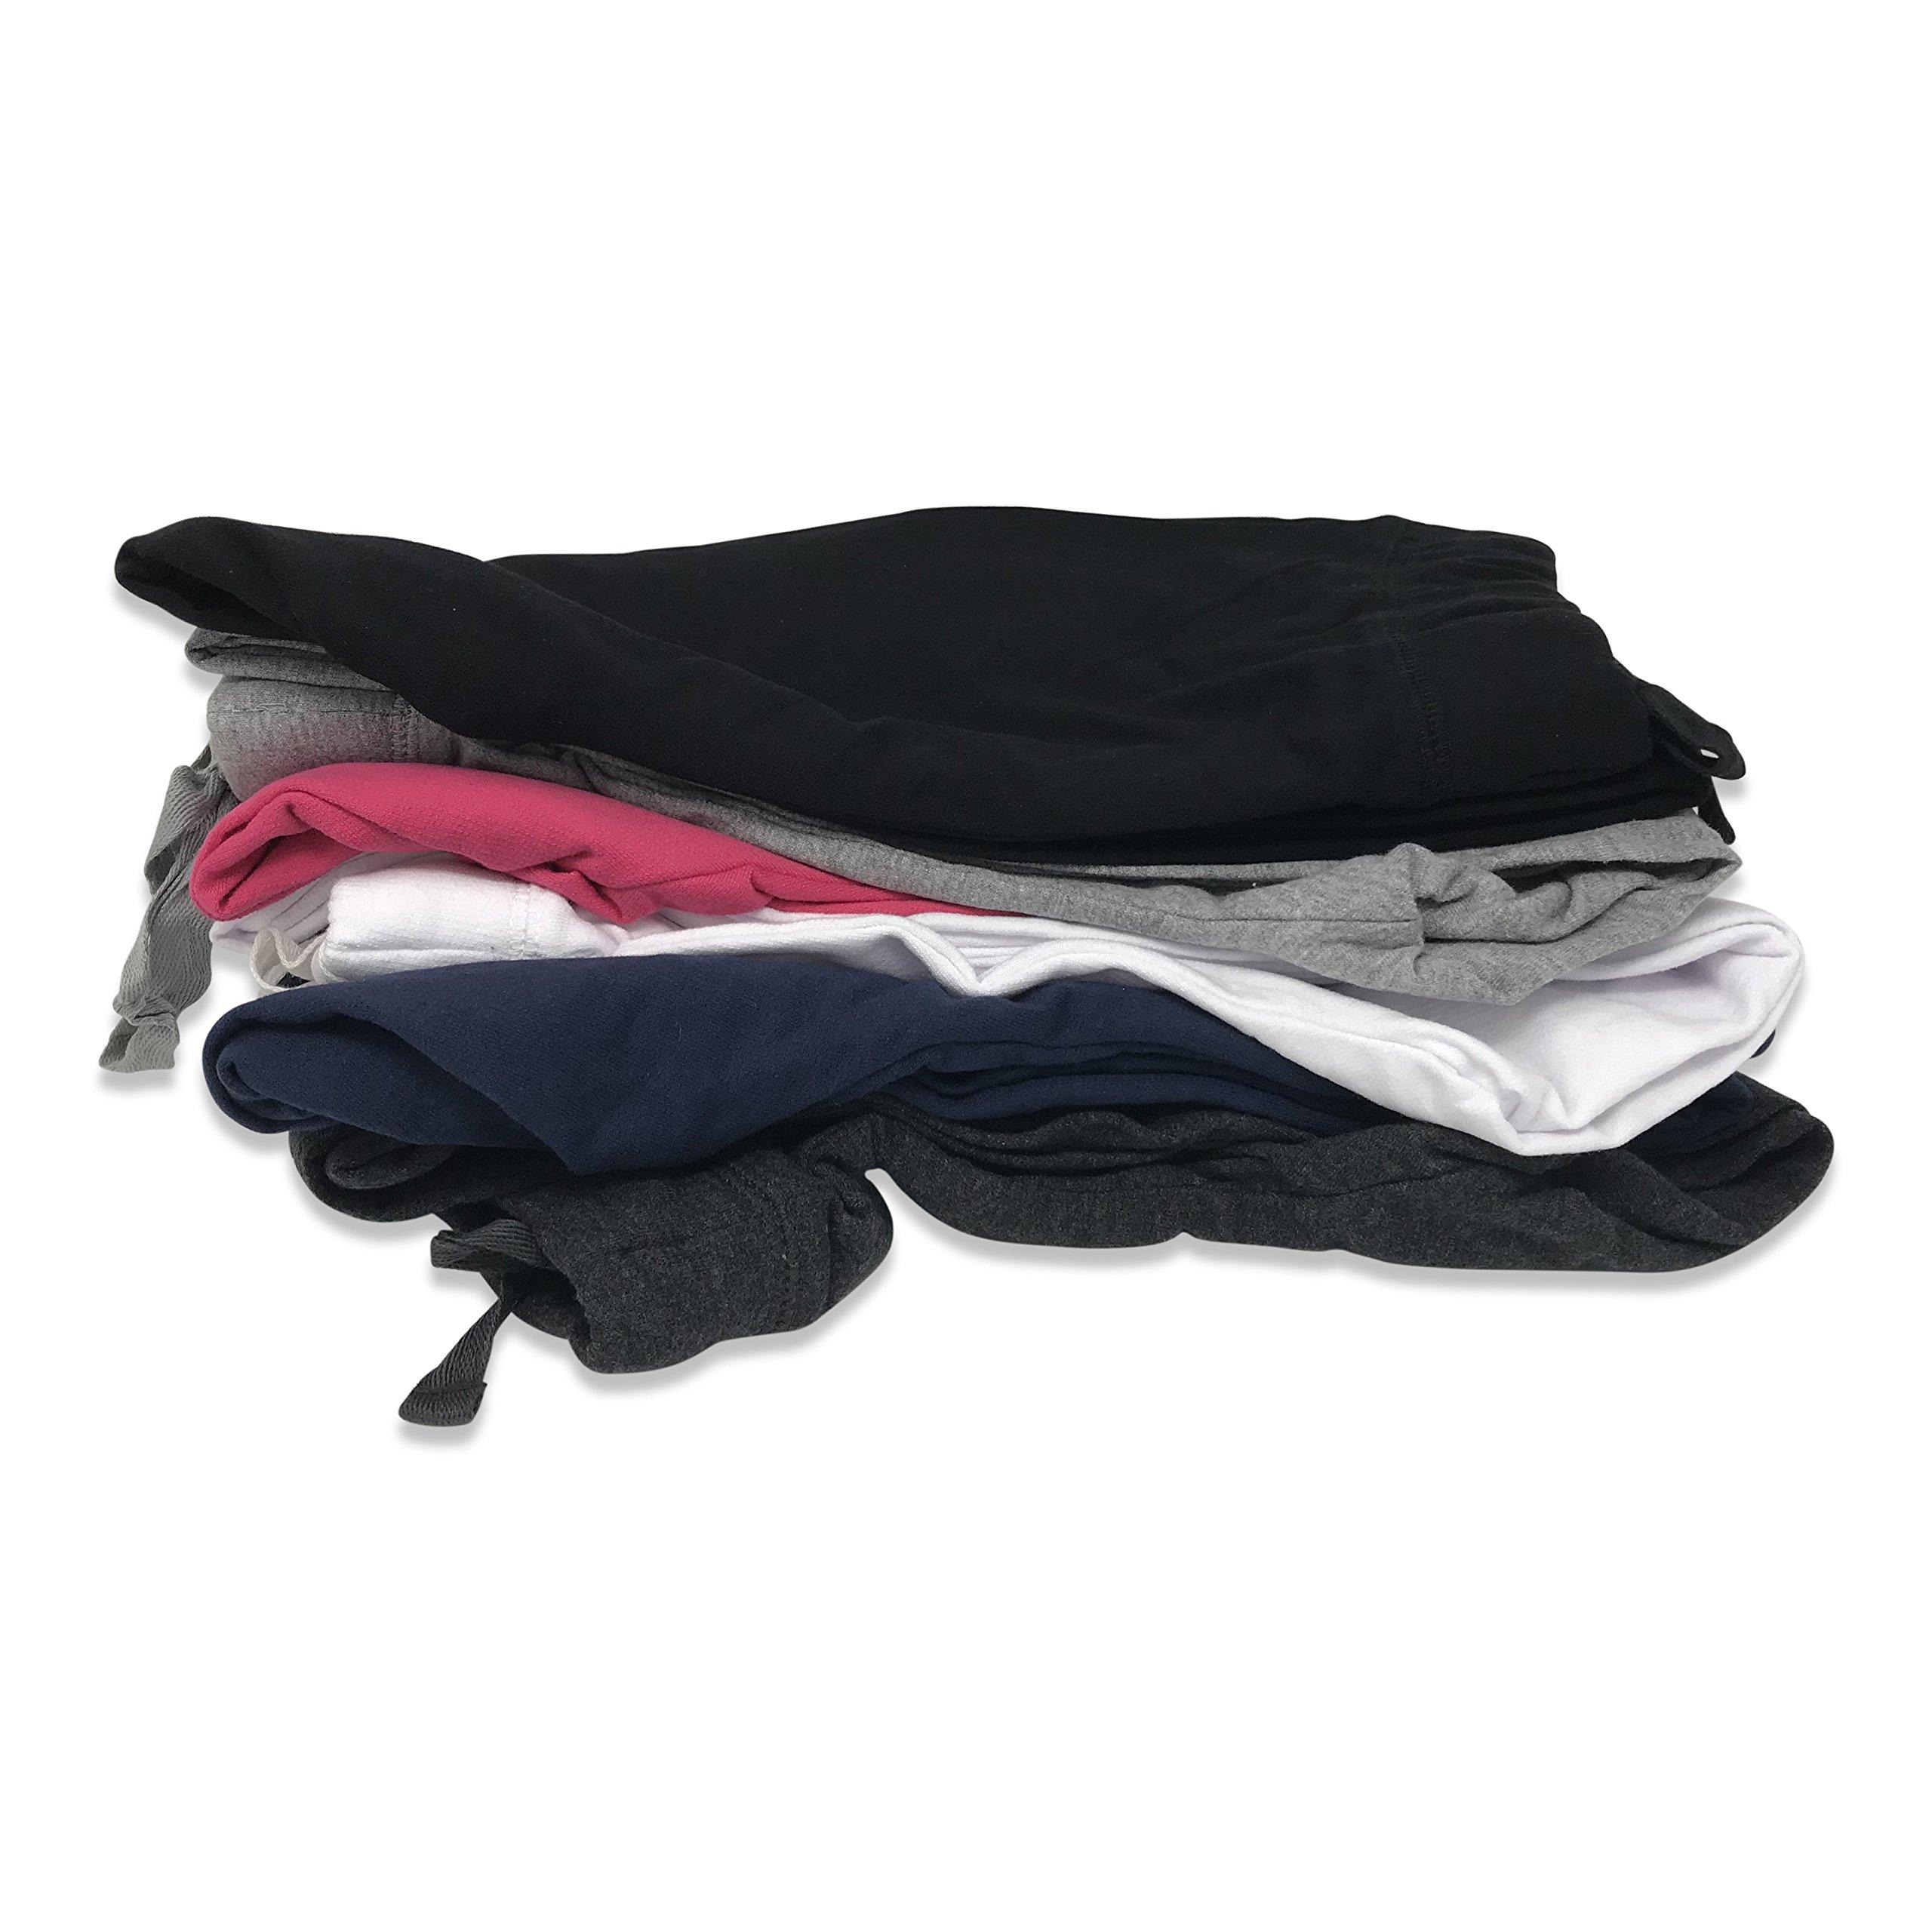 Sexy Basics Women's 2 Pack Yoga Activewear Jogger Capri Cropped Sweat Lounge Pants (2 Pack- Navy/Charcoal, Large) by Sexy Basics (Image #6)